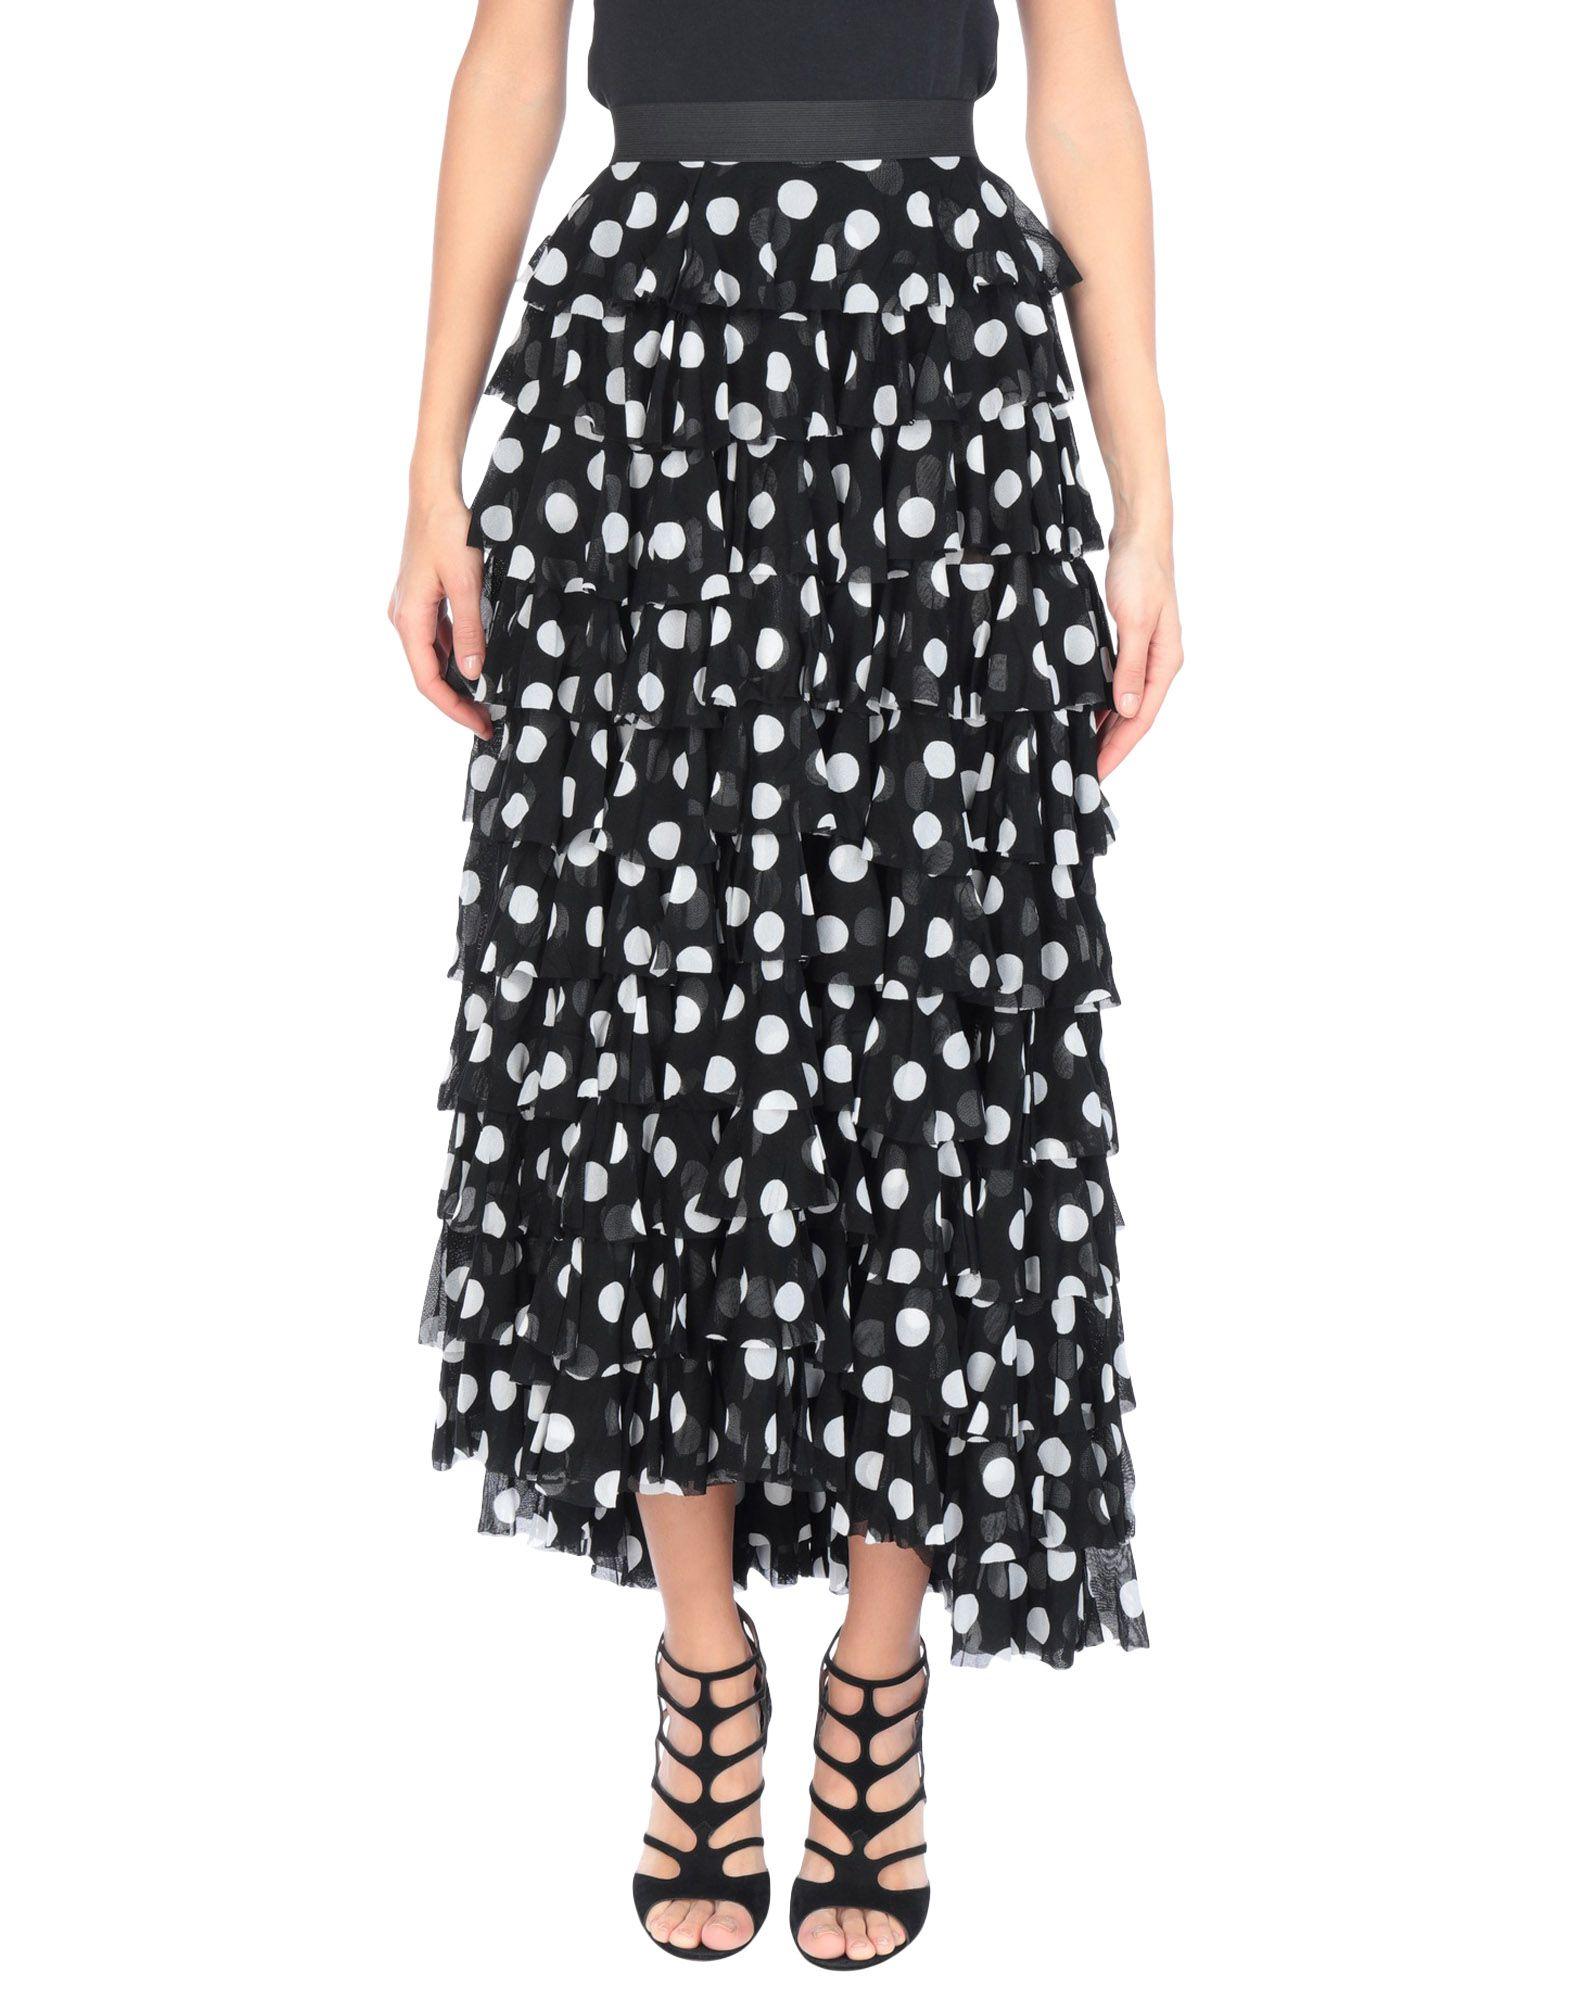 89afe9411 Faldas Largas Trapecio Mujer | Wig Elegance